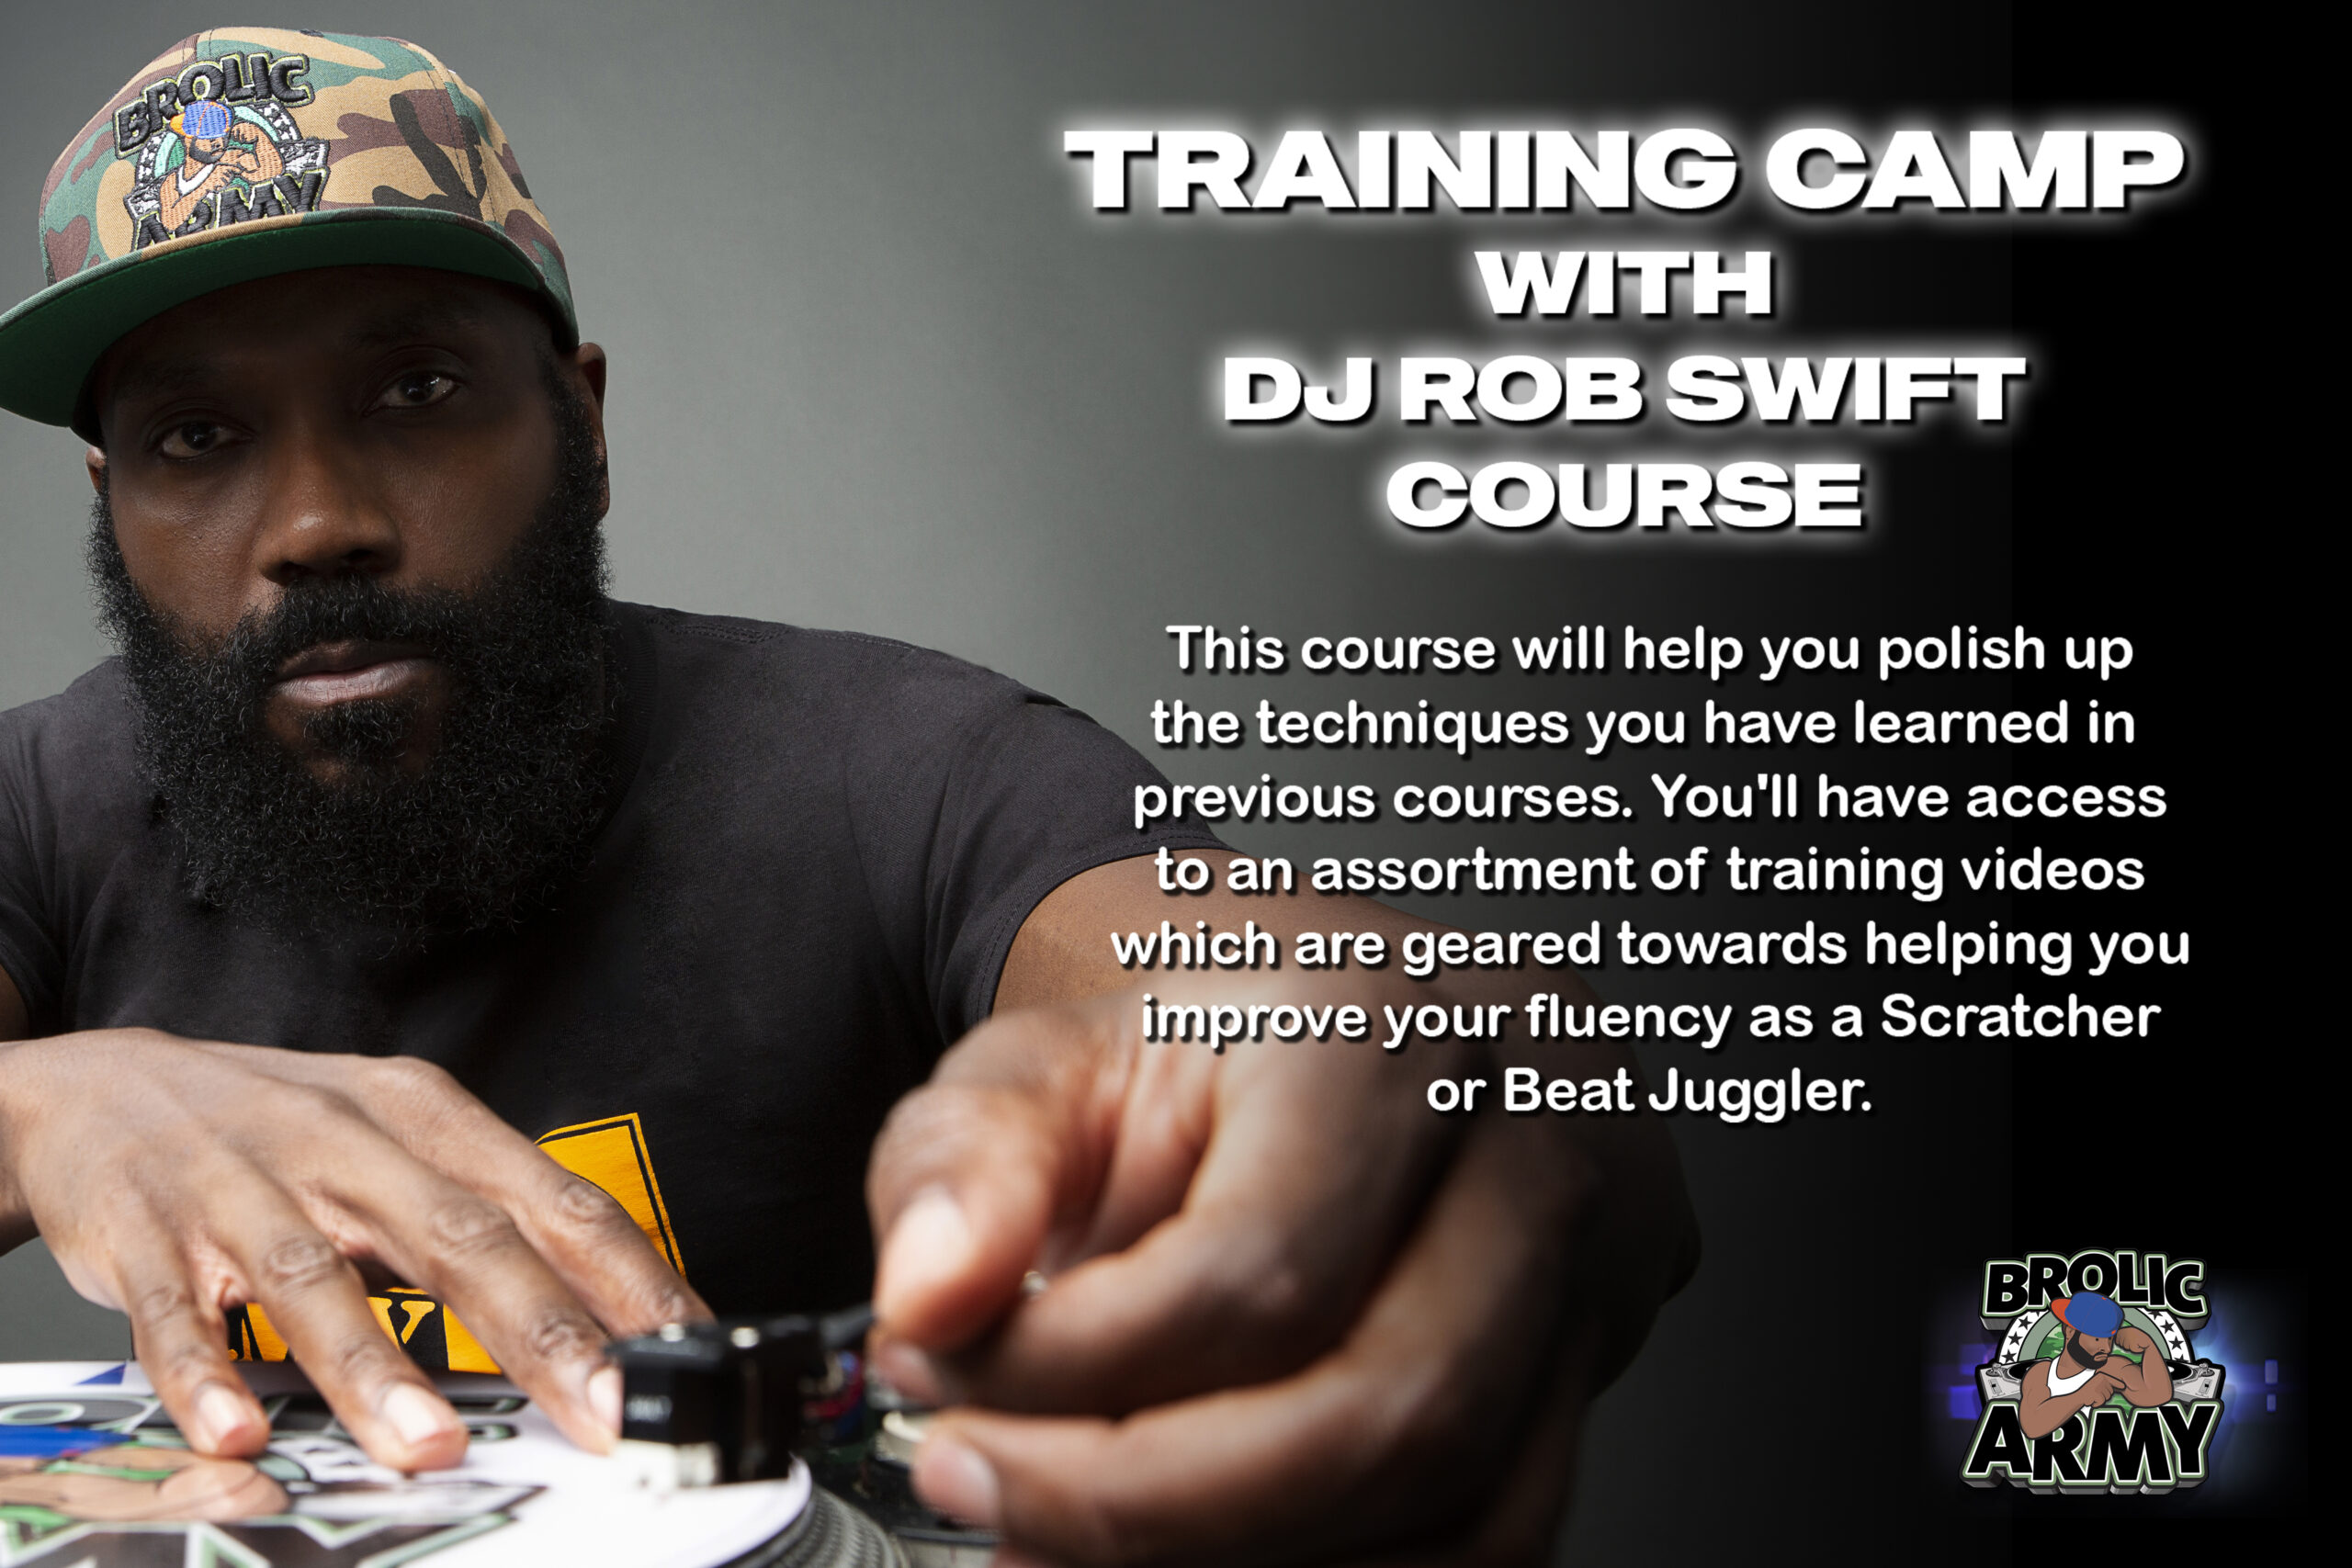 Training Camp with DJ Rob Swift